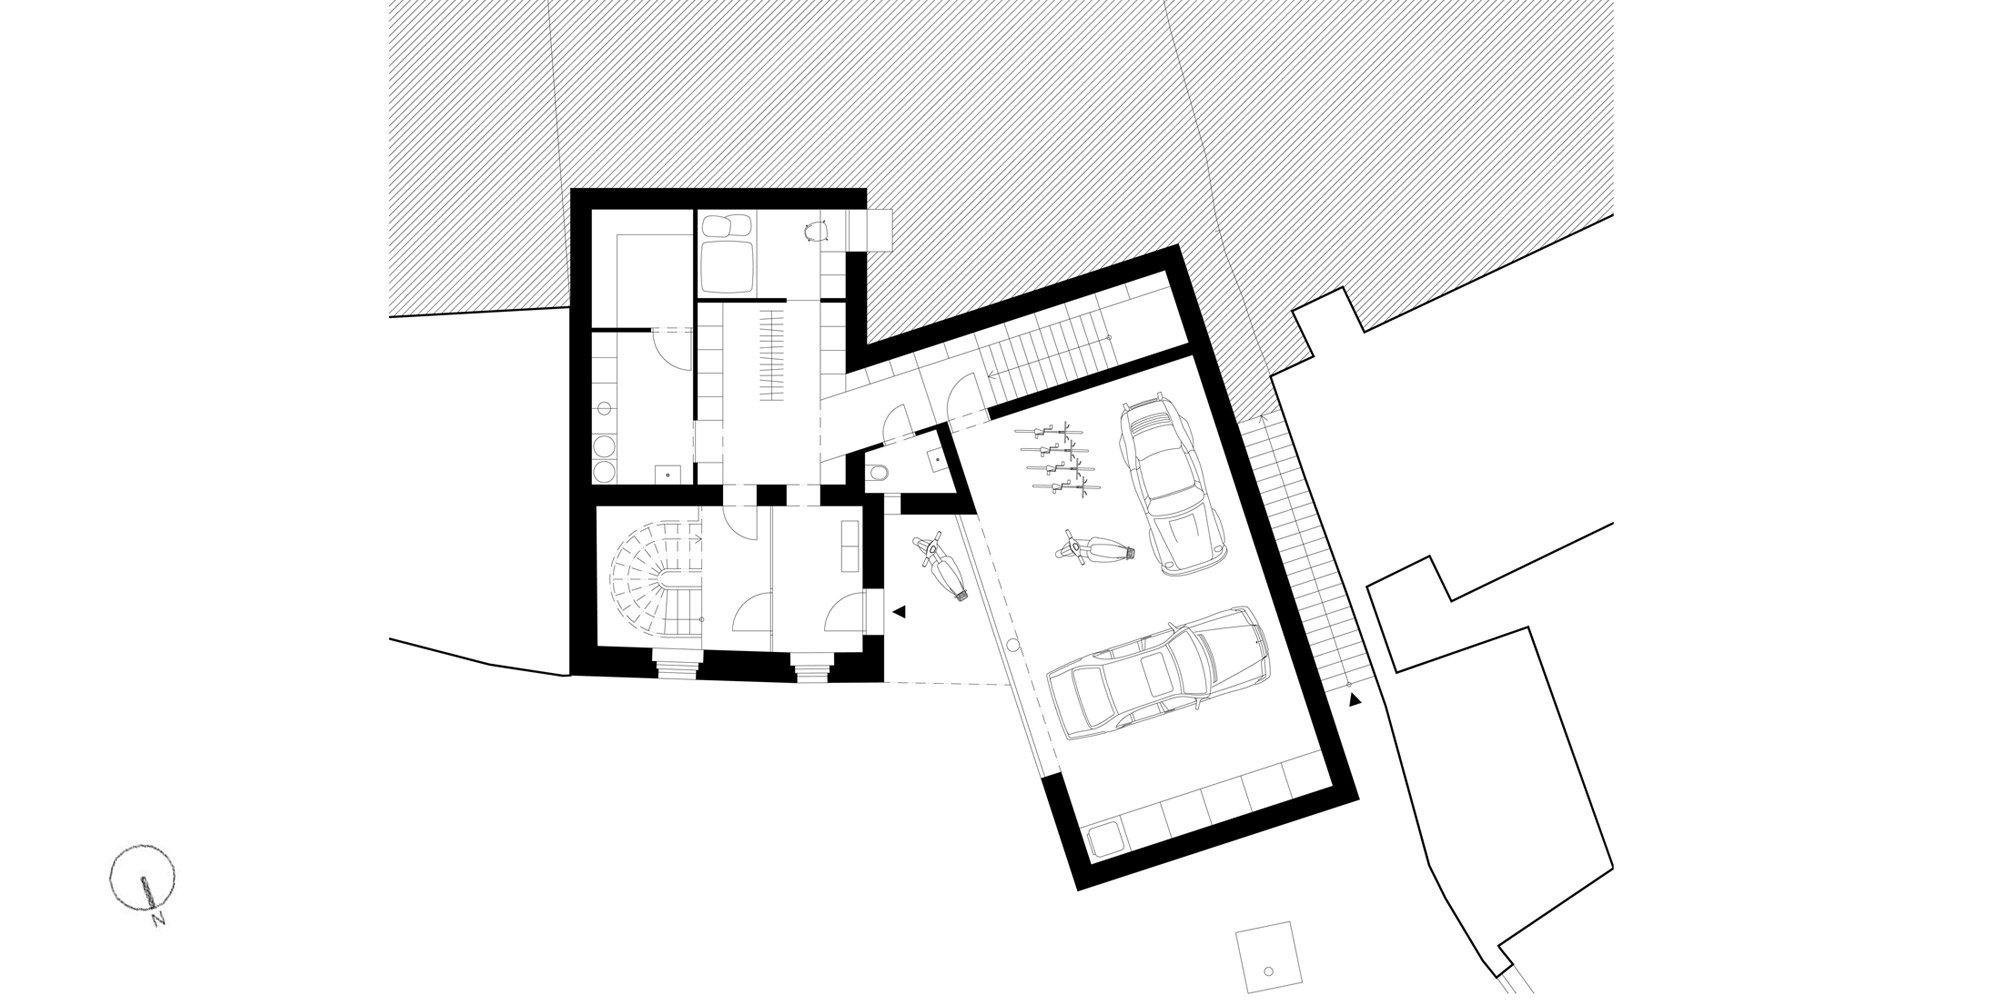 Pianta piano terra © Atelier 111 architekti